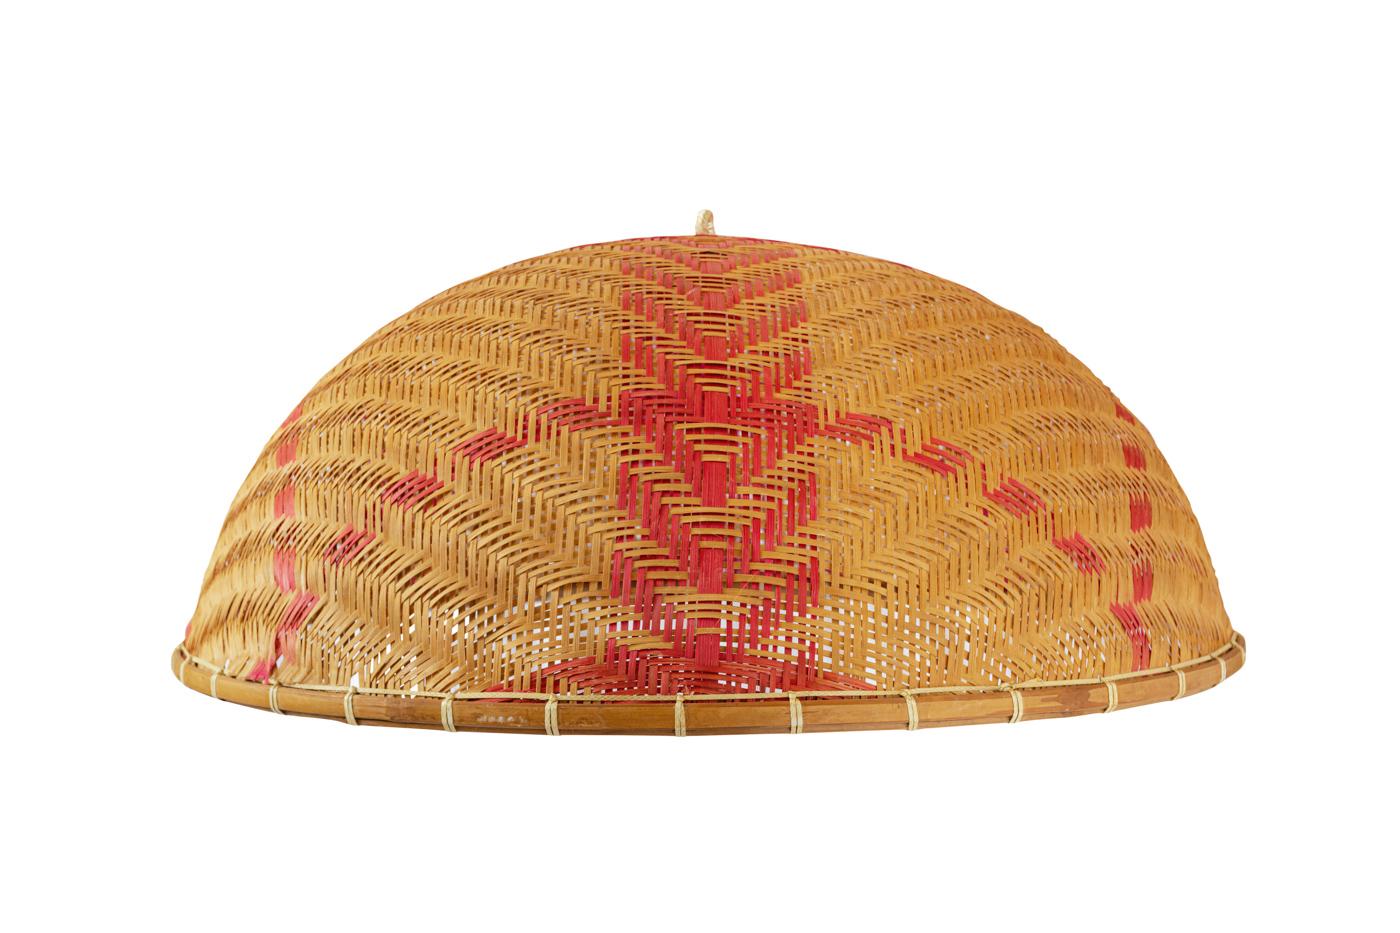 Cobertor de comida tradicional Tailandés